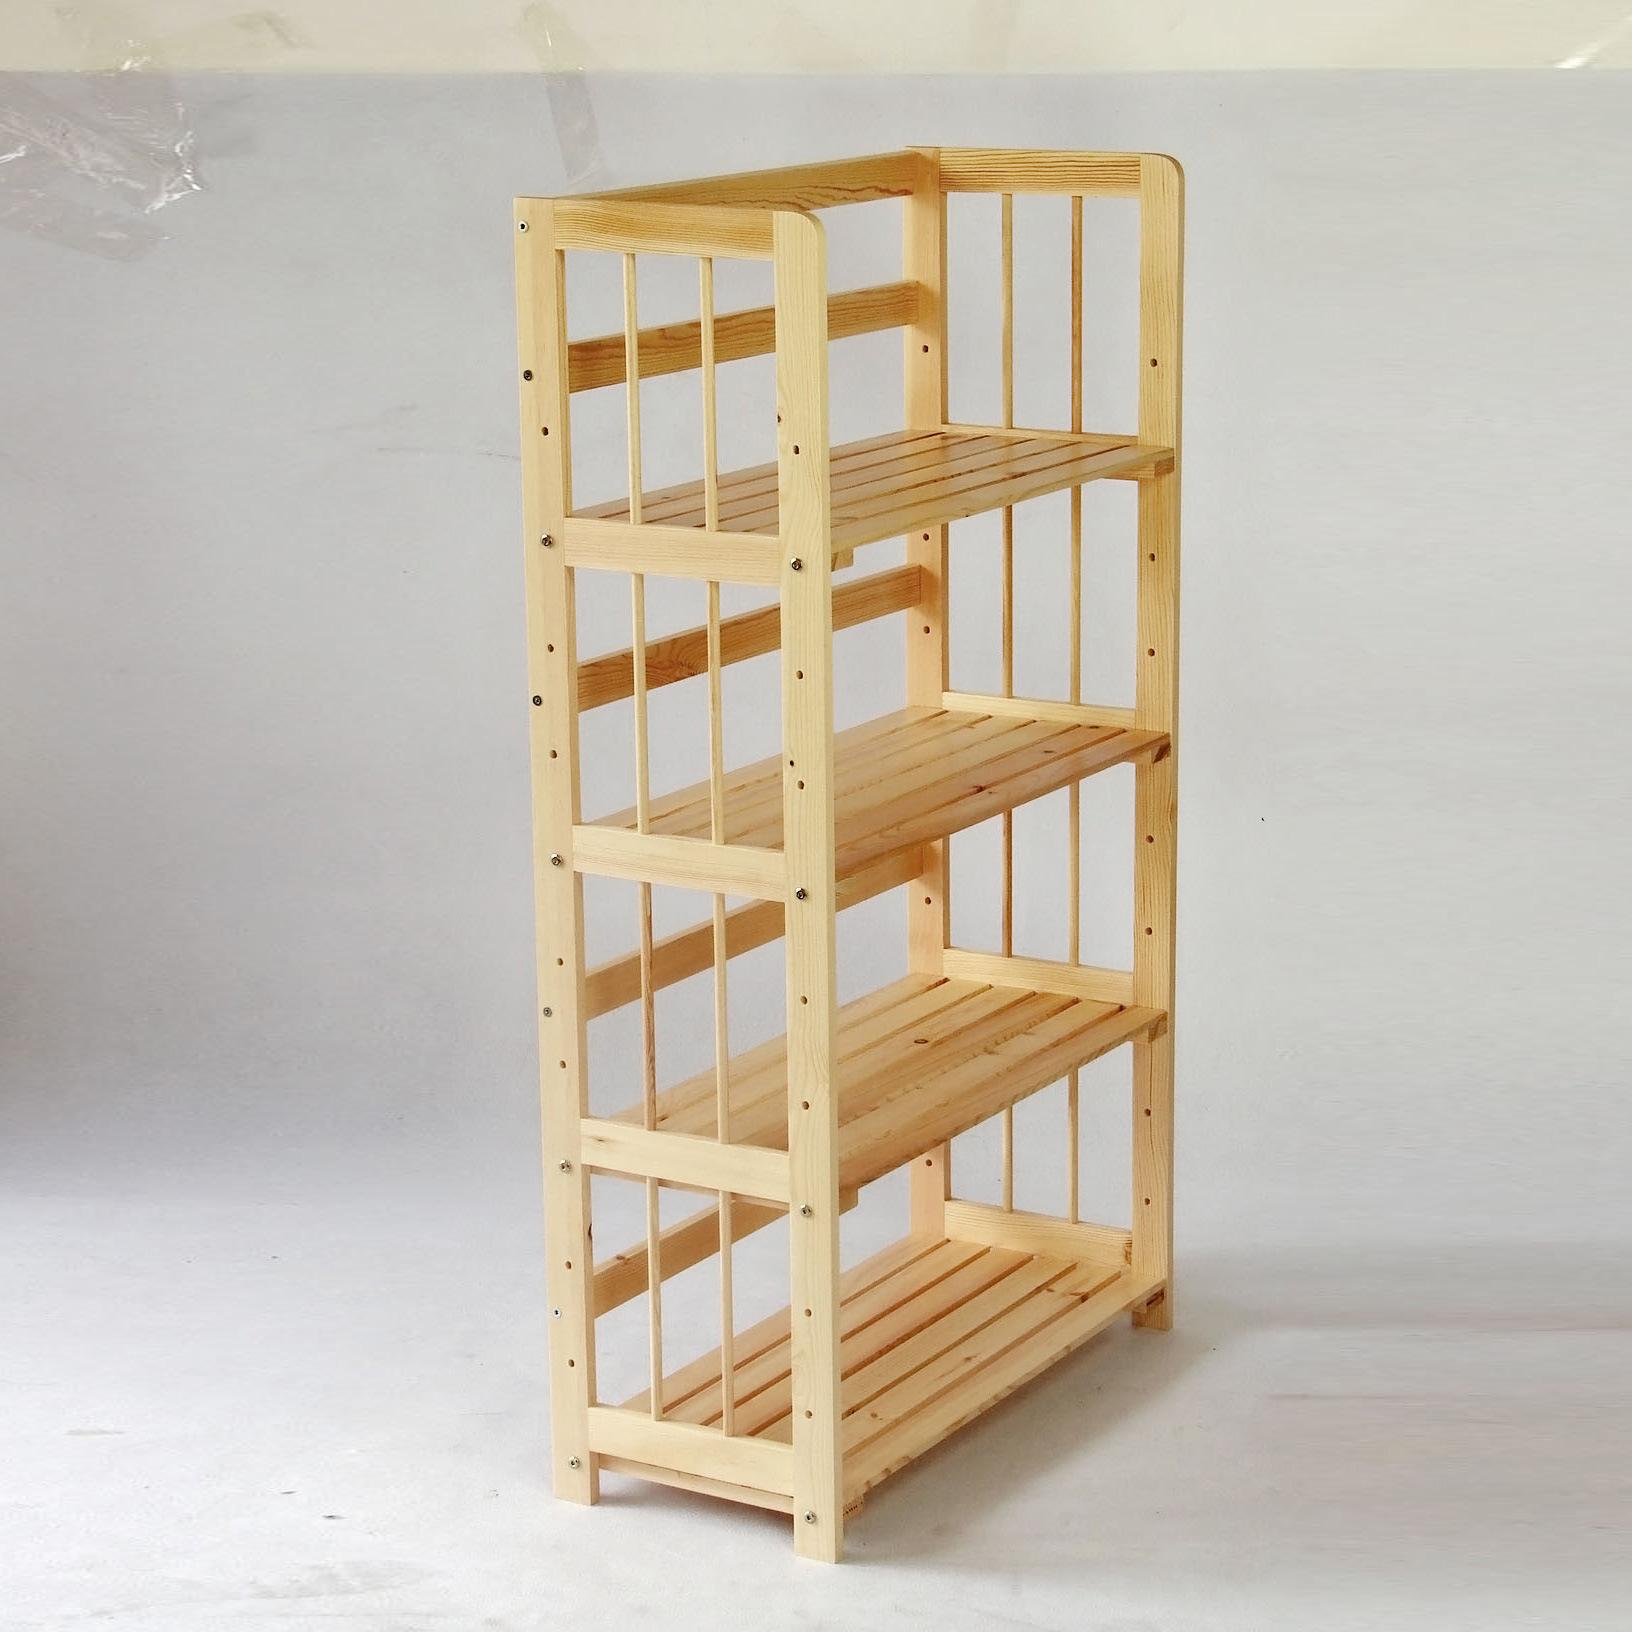 kiefer regal gallery of regal eckregal kiefer massiv vollholz natur abmessung x x cm with. Black Bedroom Furniture Sets. Home Design Ideas